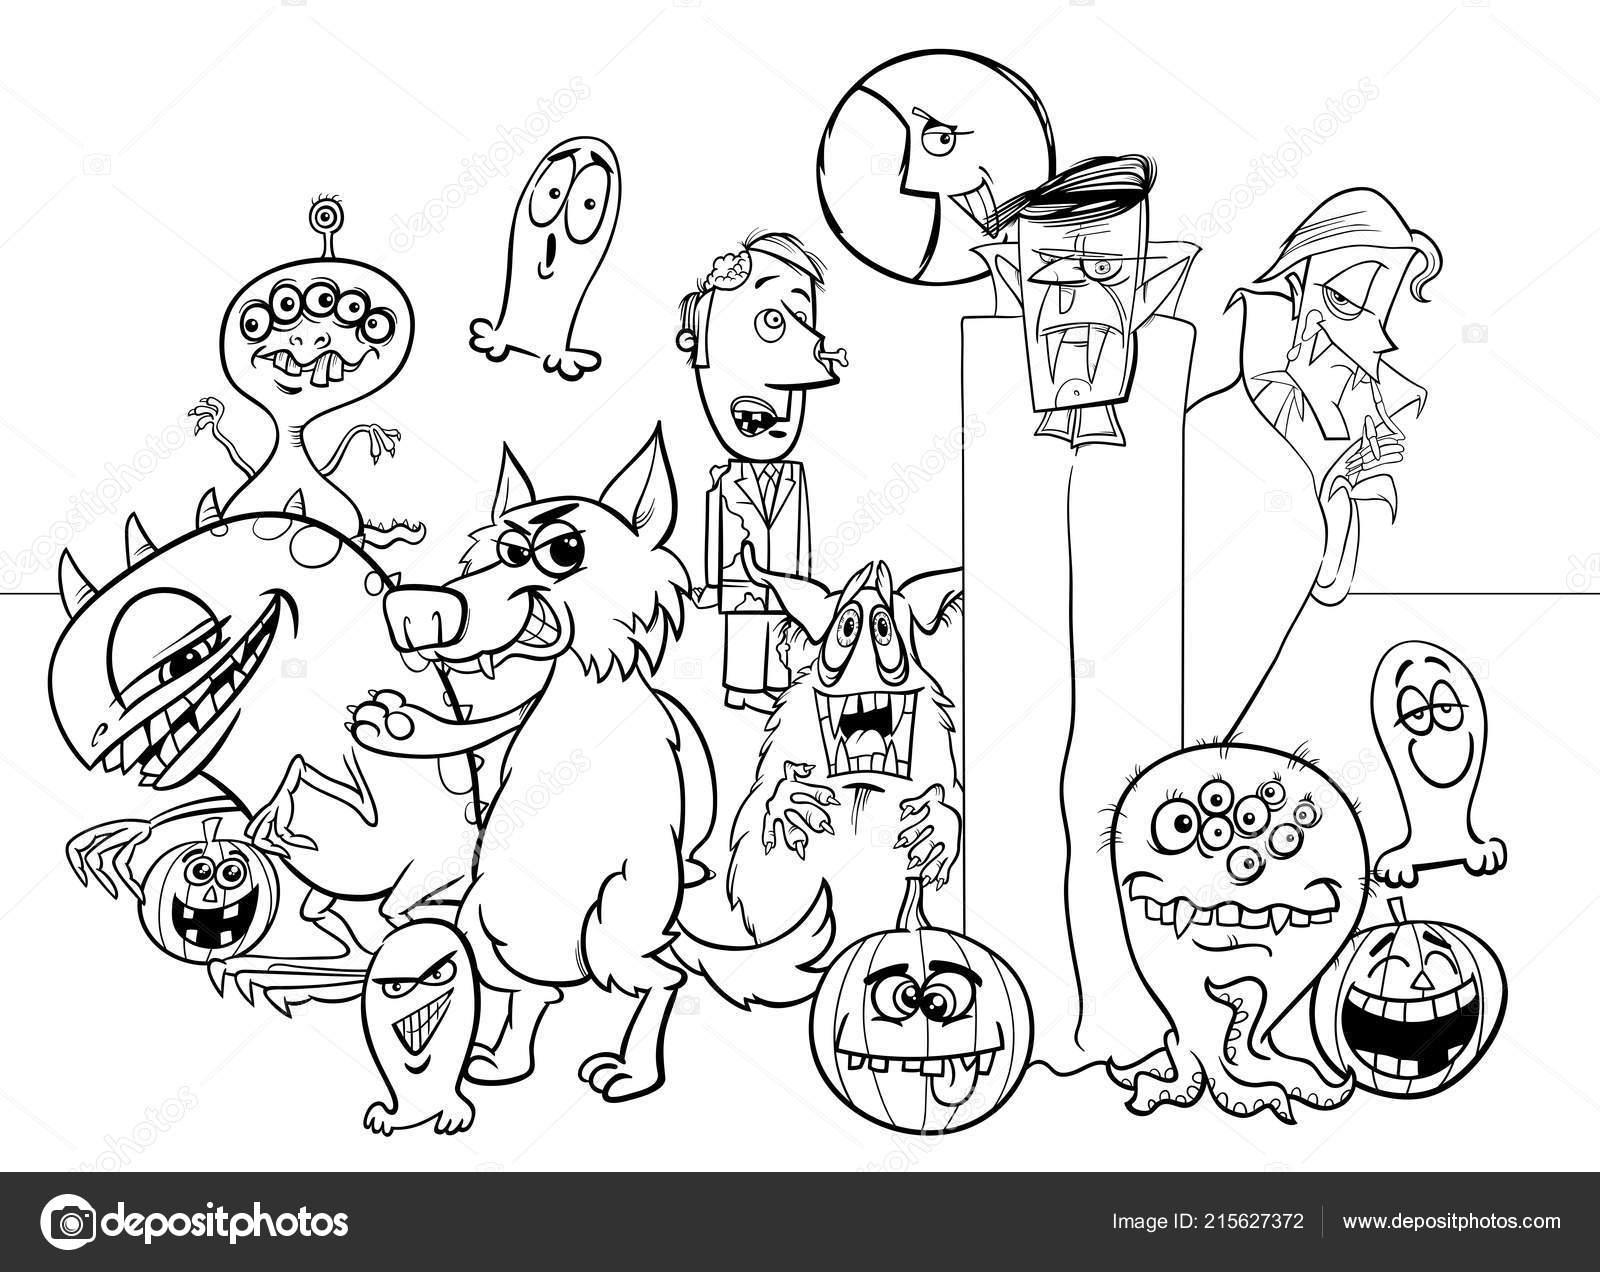 Black White Cartoon Illustration Halloween Holiday Monster Characters Group Coloring Stock Vector C Izakowski 215627372